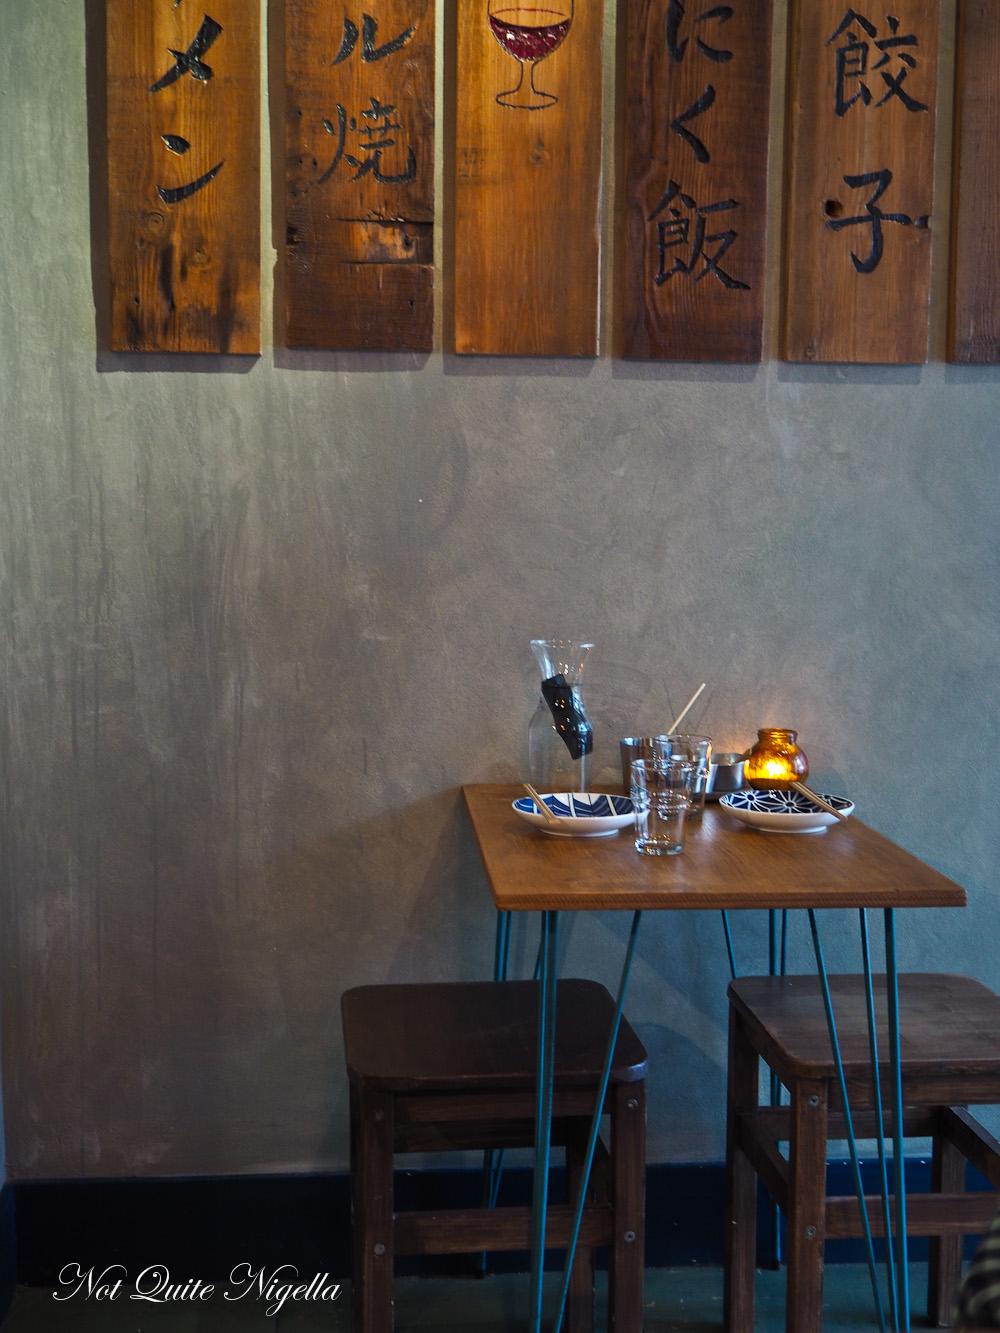 Chaco Bar Darlinghurst